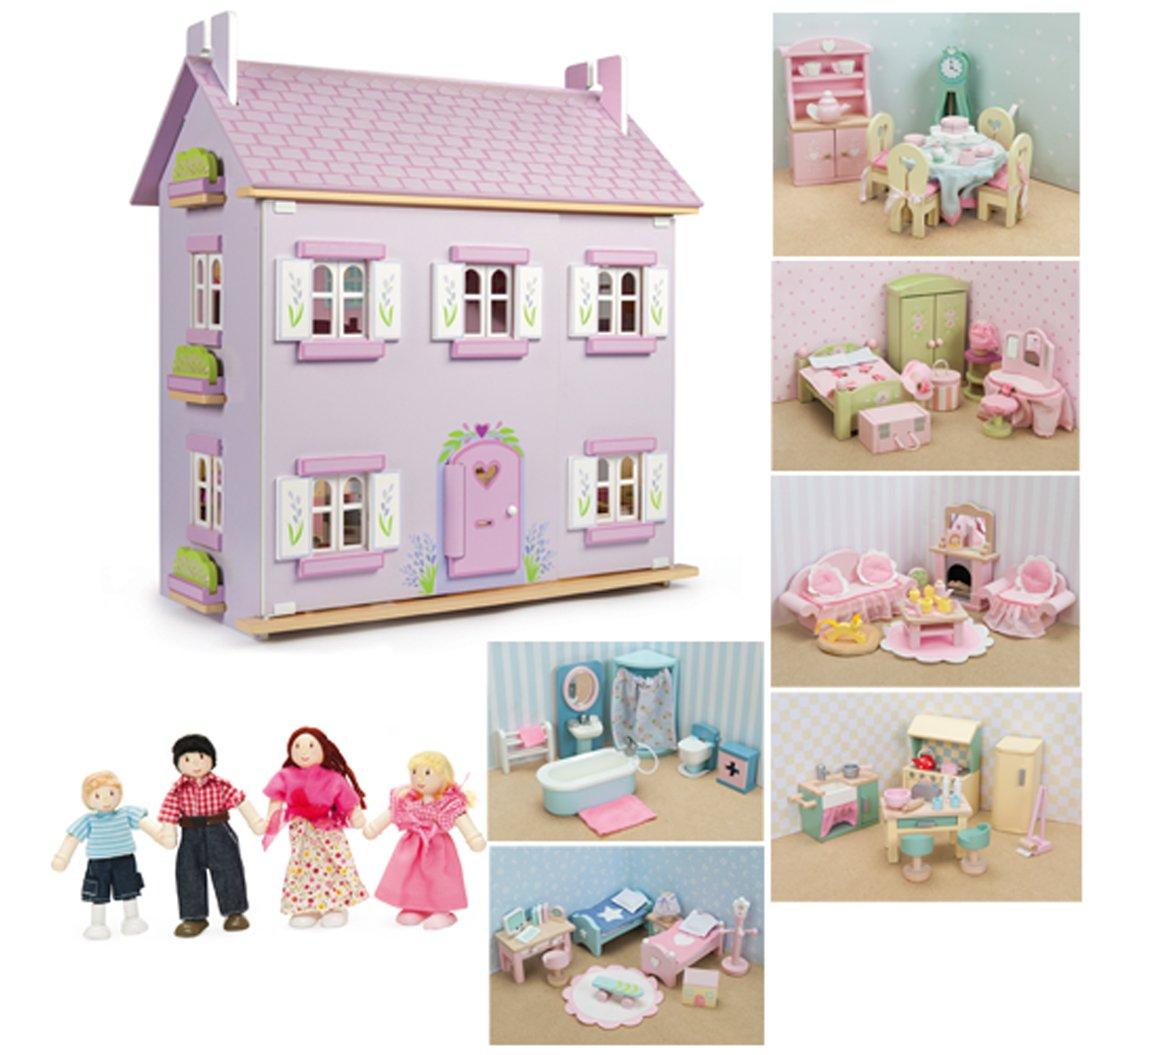 Le Toy Van Lavendel Haus Puppenhaus Aus Holz Mit Möbeln (6 Sets Daisylane  Möbel + Puppen): Amazon.de: Baumarkt